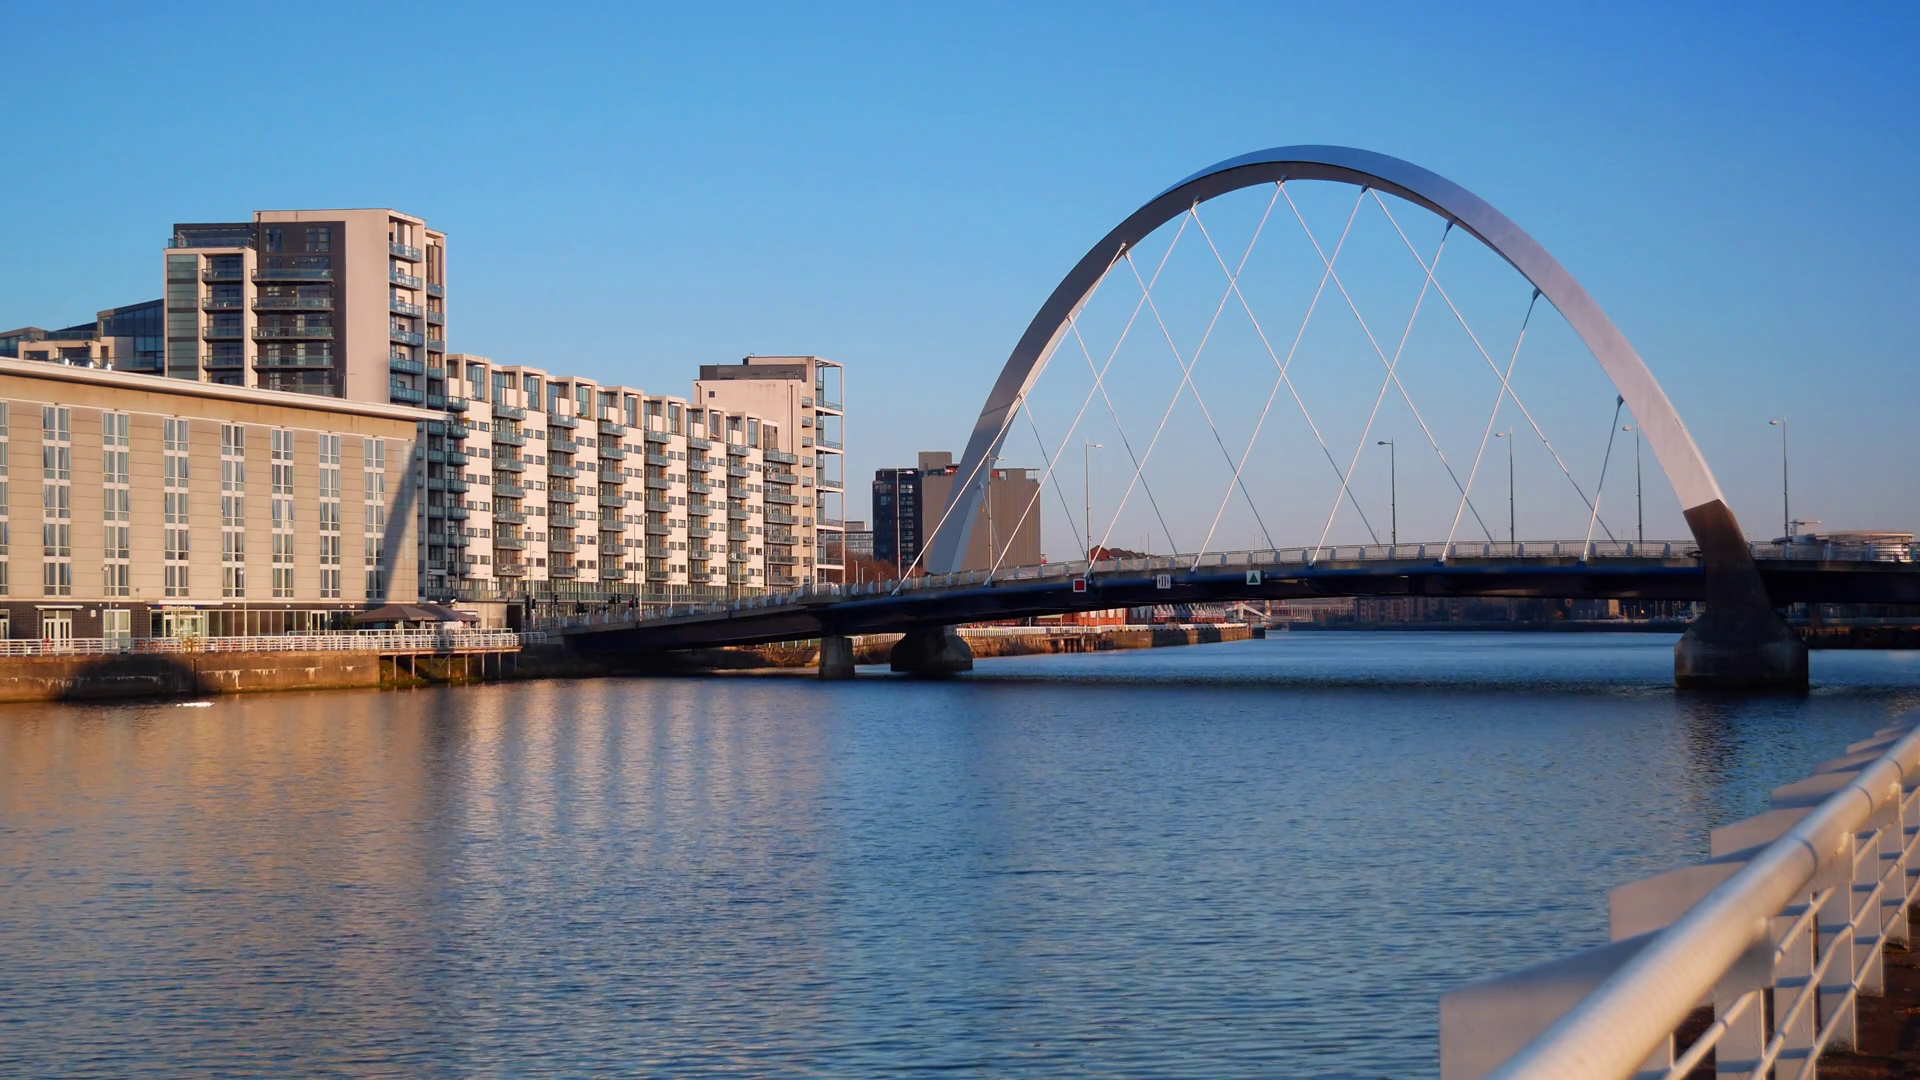 Sunset Blue Hour Time Lapse at Clyde Arc Bridge, Glasgow, Scotland ...